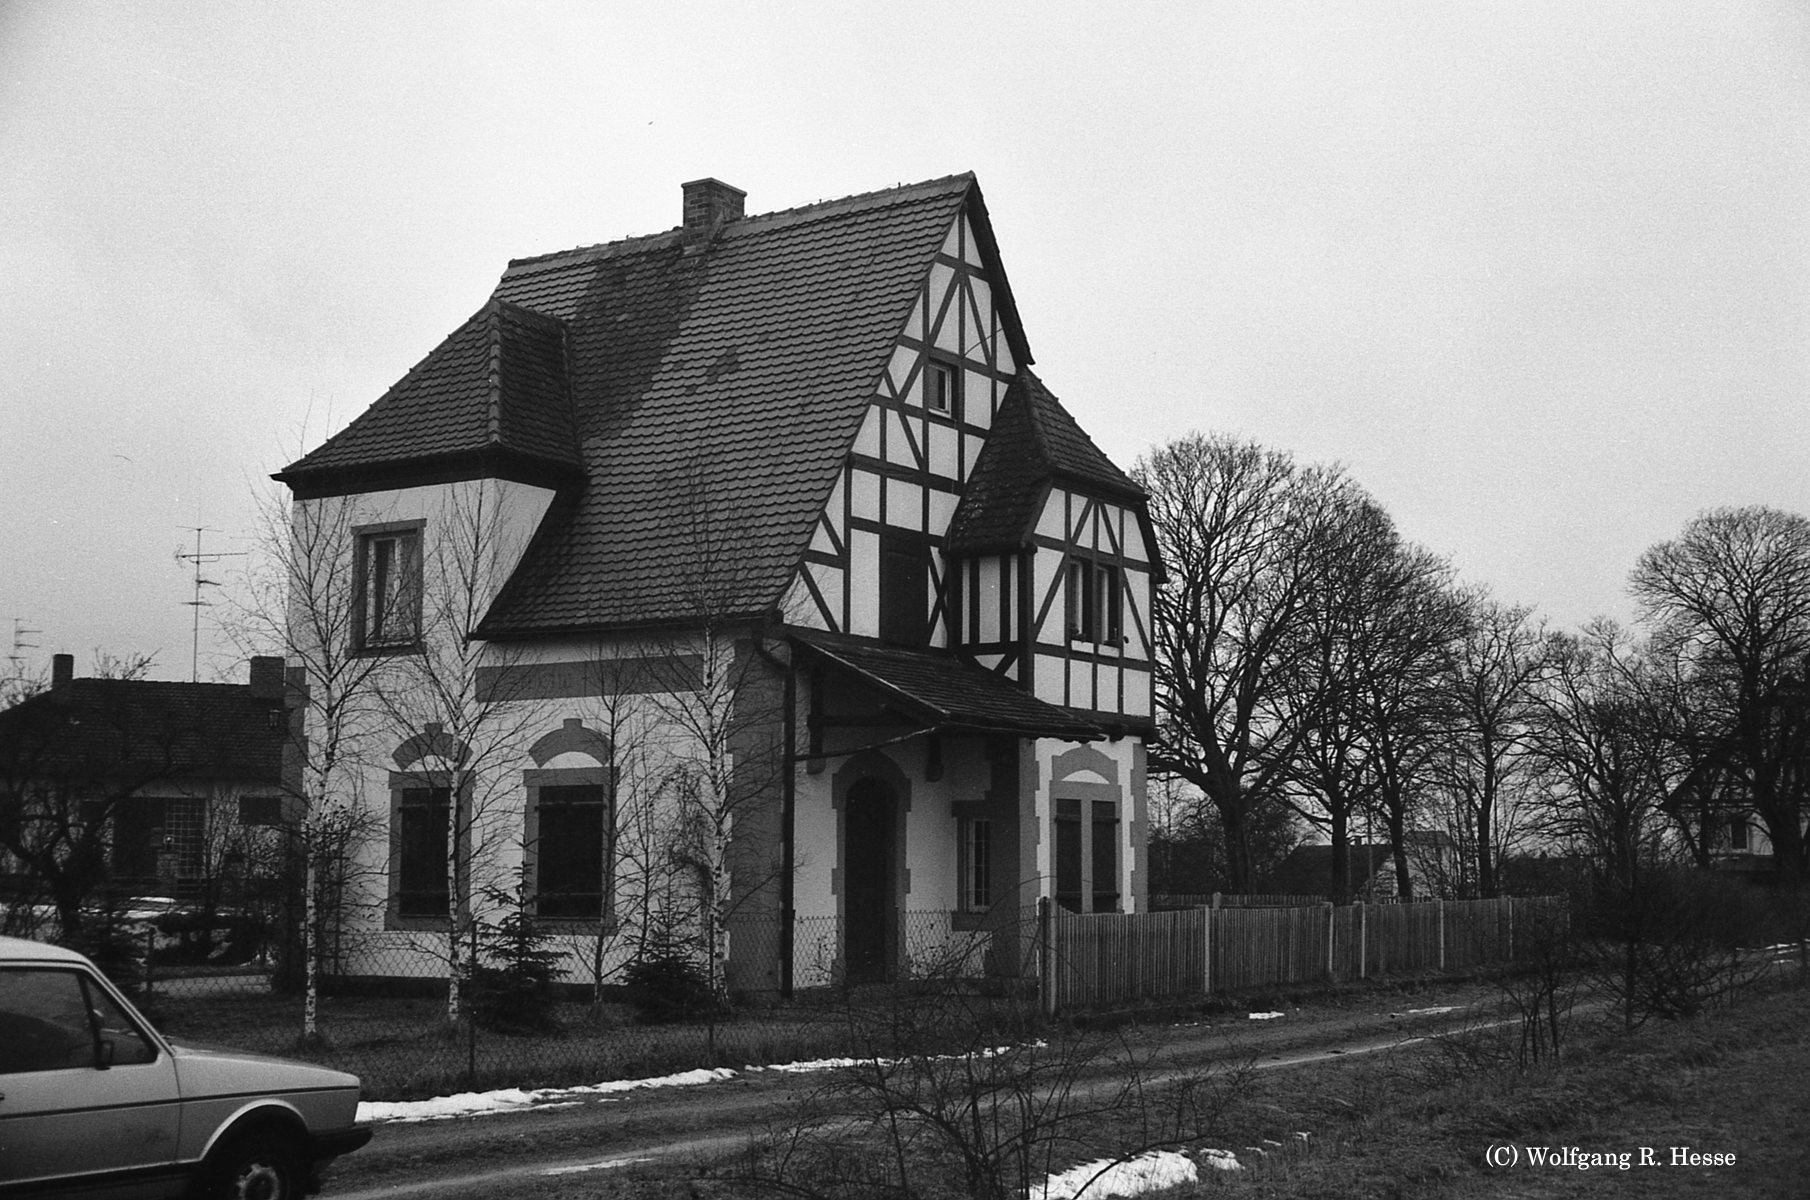 Bhf-Östheim-Gailnau